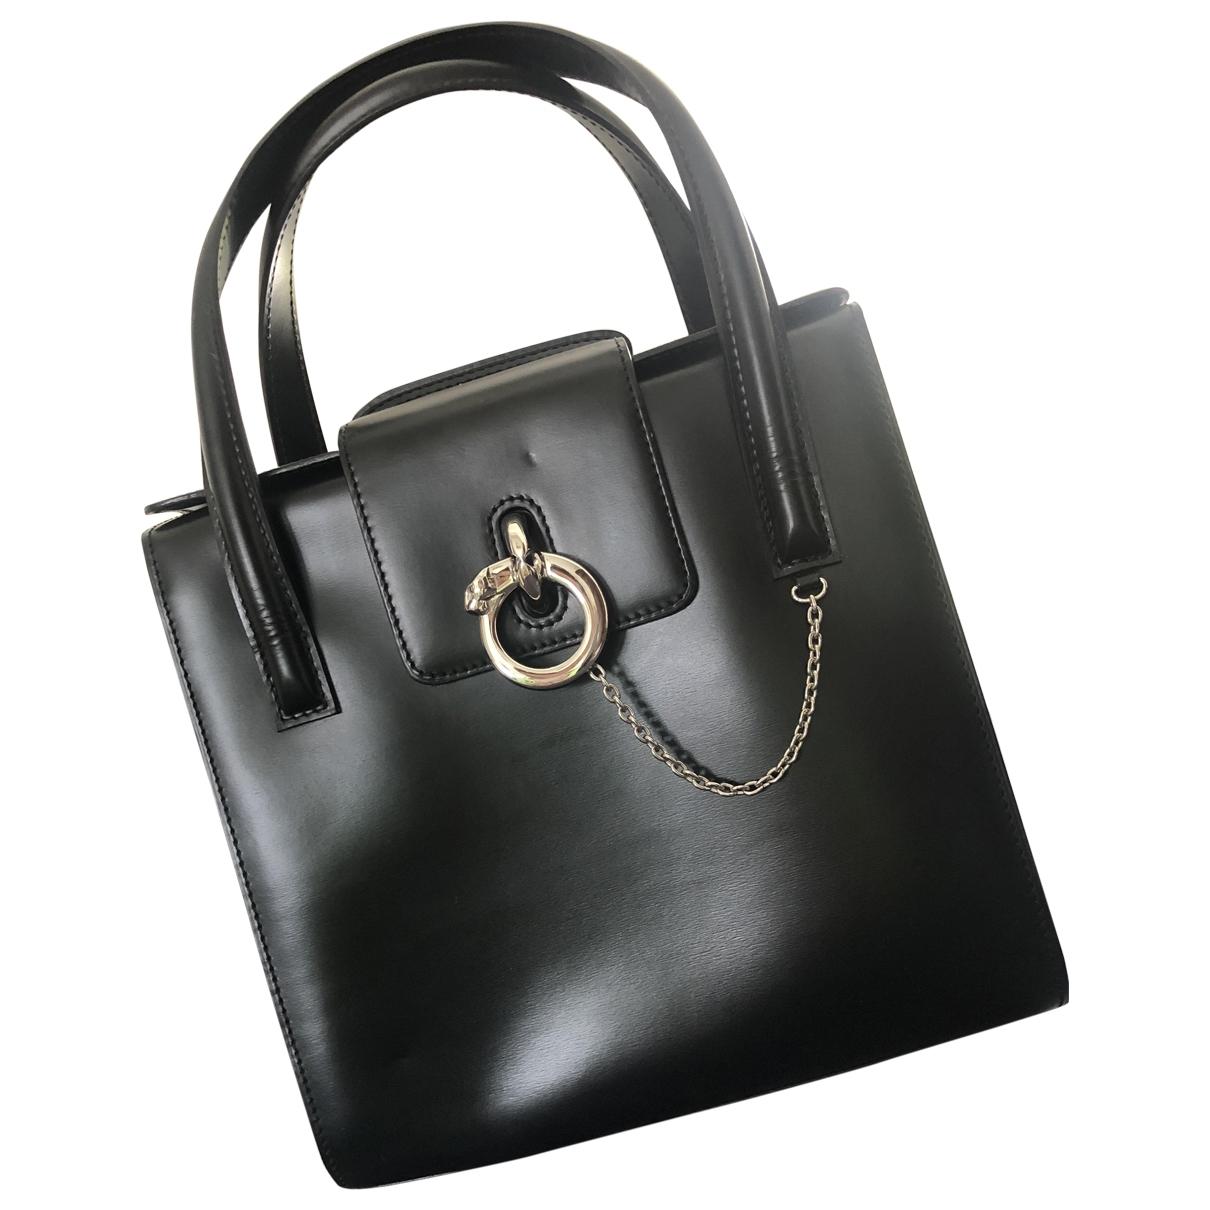 Cartier Panthere Handtasche in  Schwarz Leder